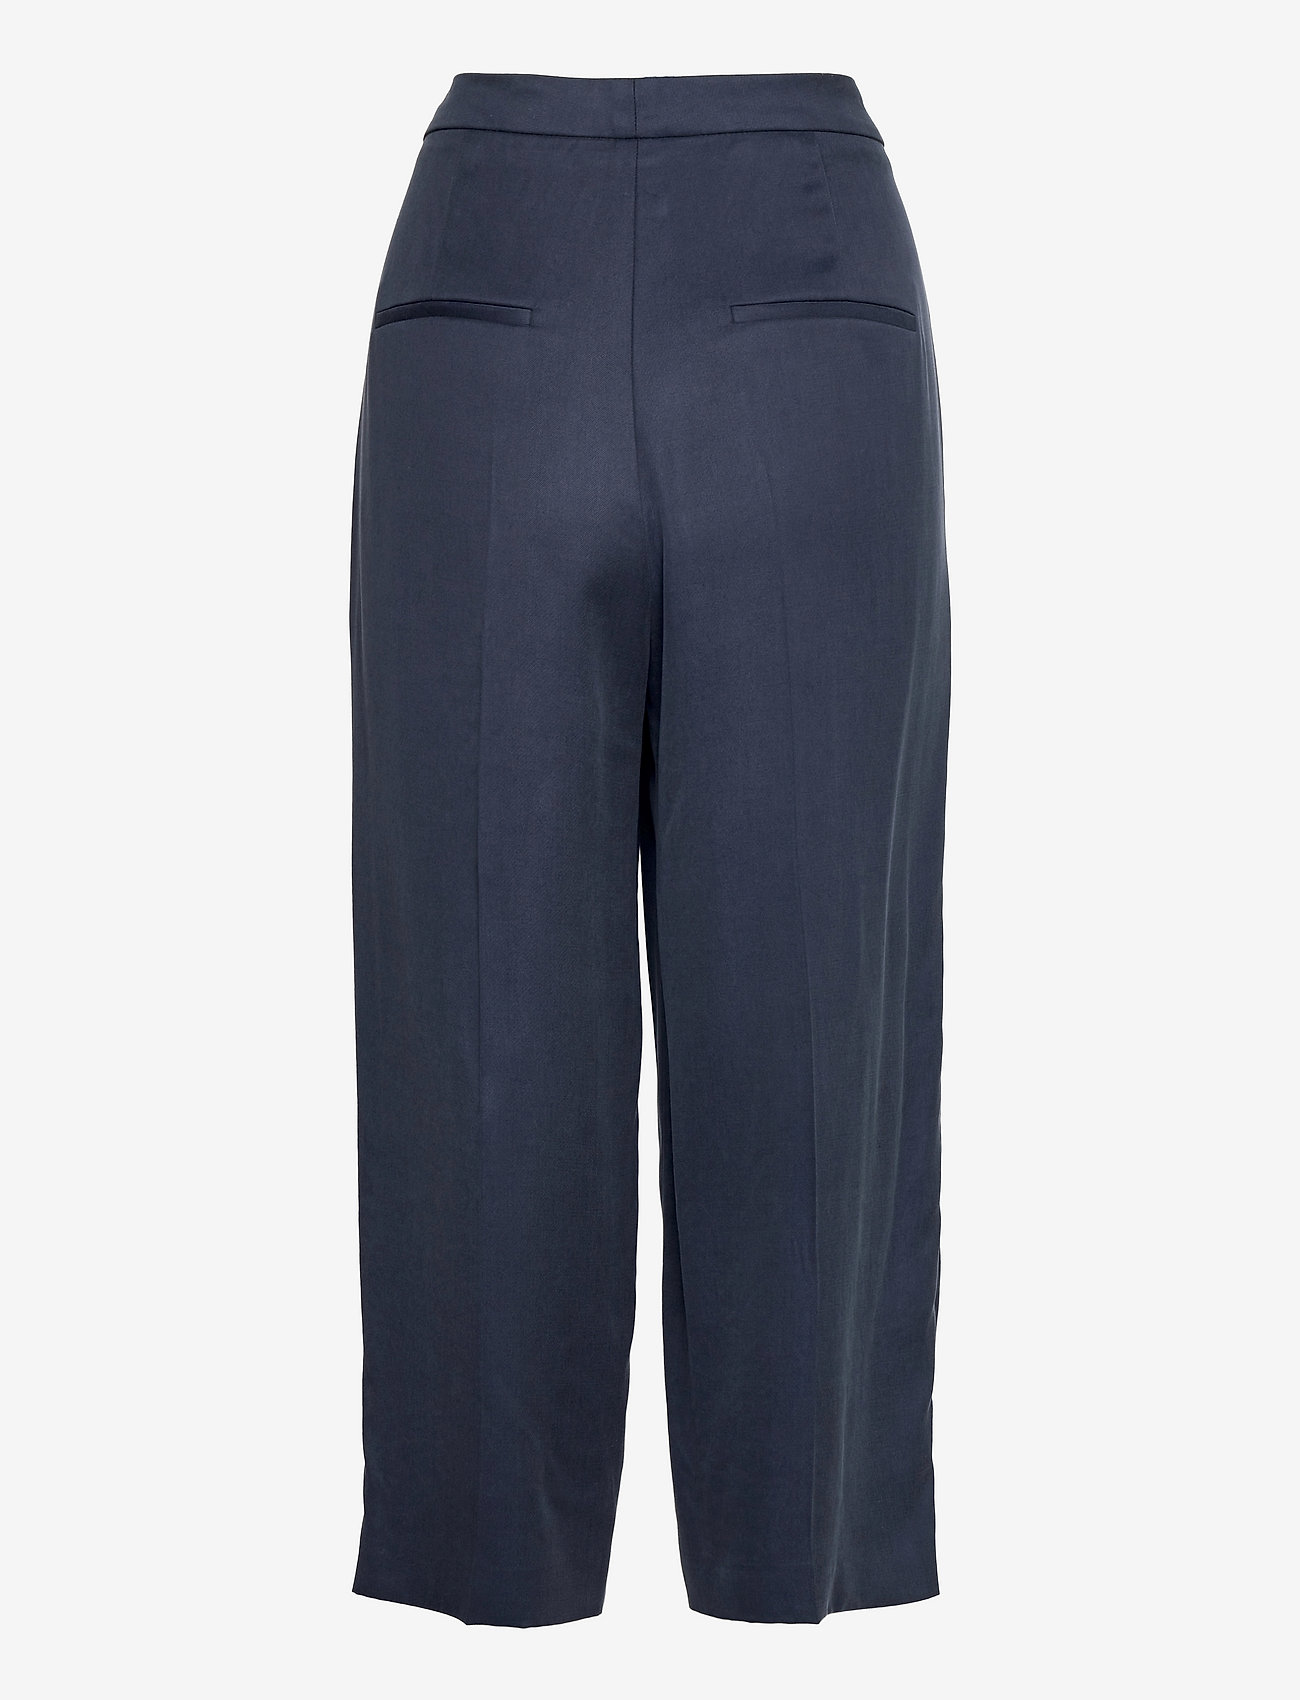 HUGO - Hakisa - bukser med brede ben - dark blue - 1